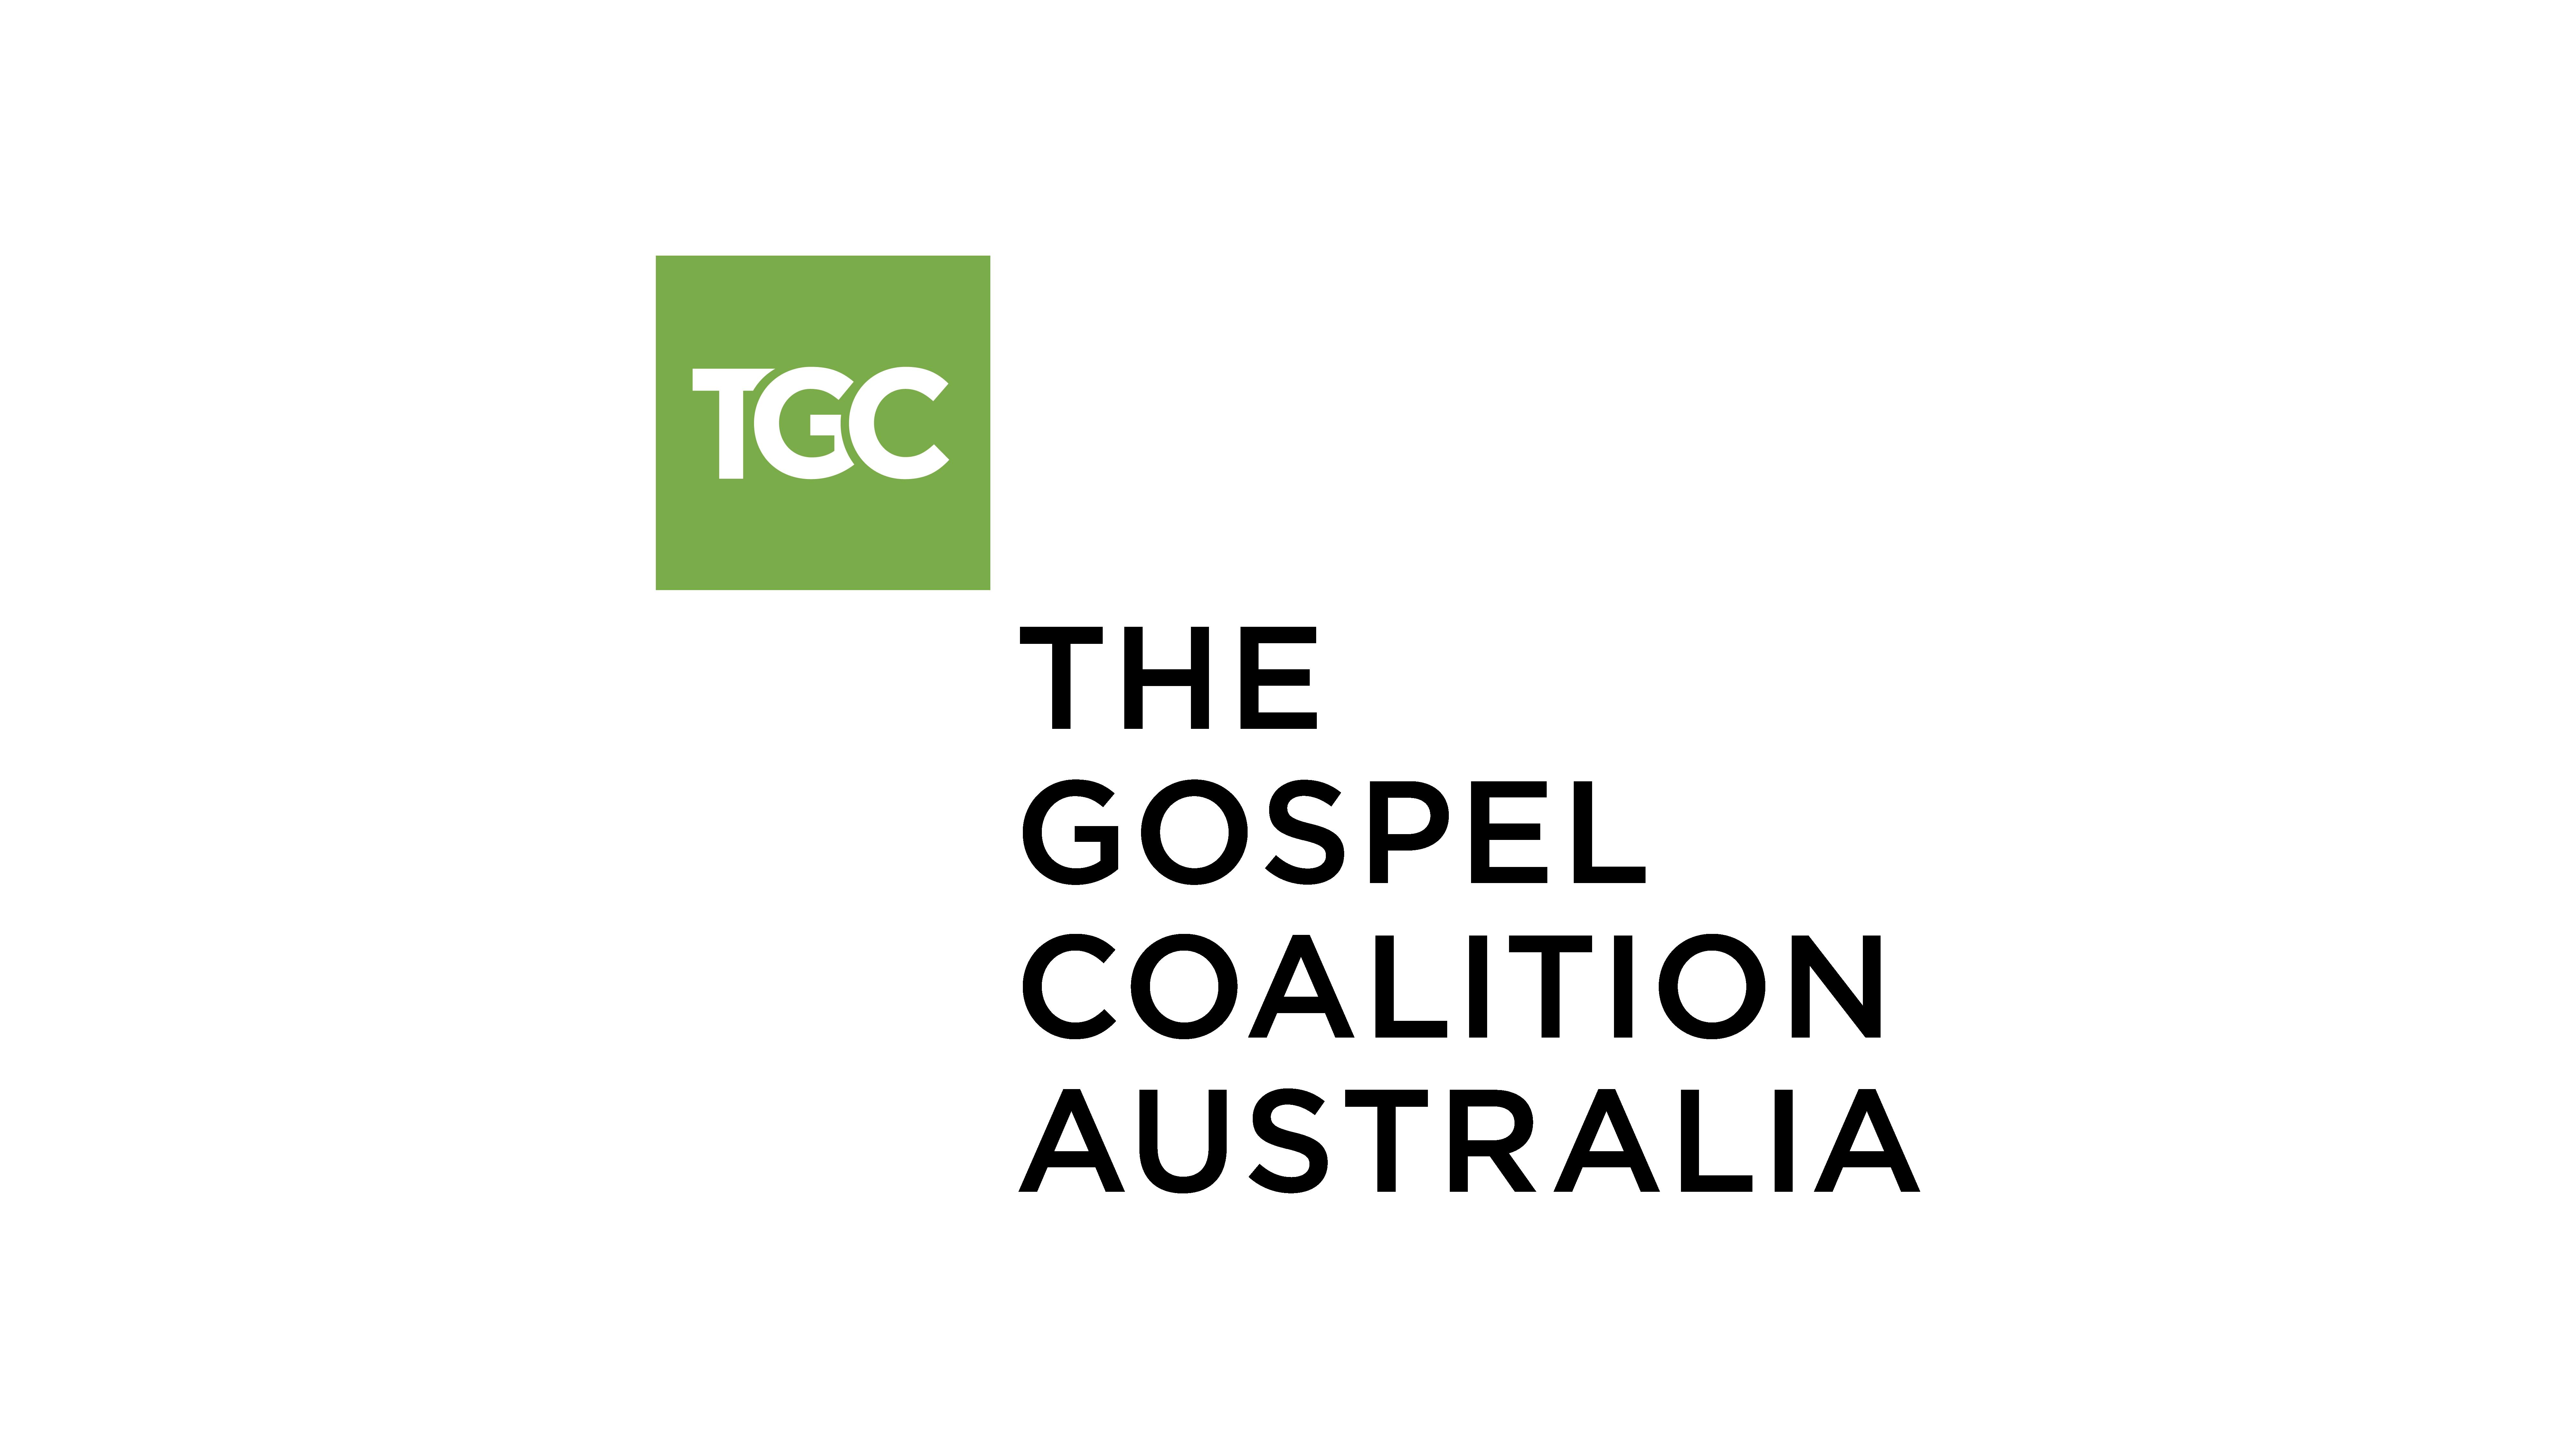 The Gospel Coalition Australia logo